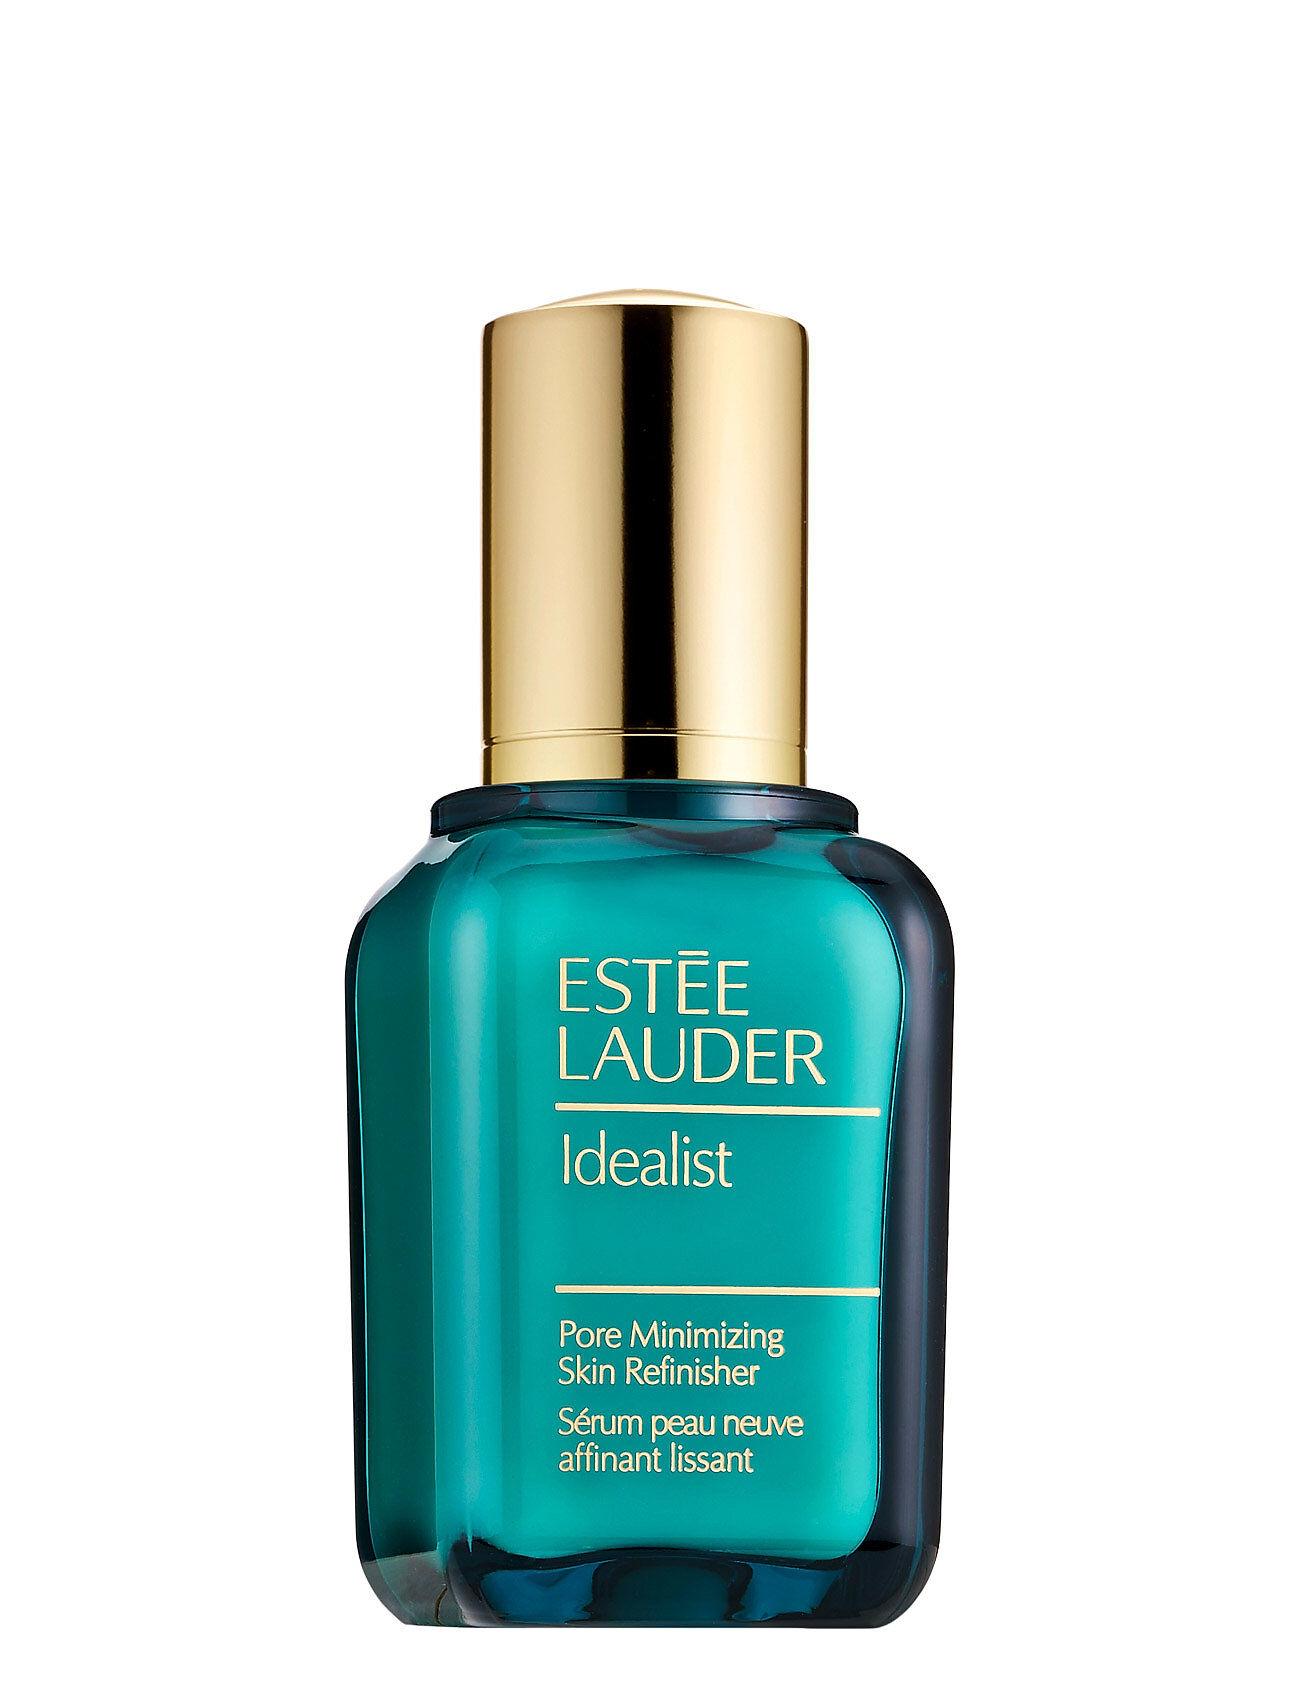 Estée Lauder Idealist Pore Minimizing Skin Refinisher Seerumi Kasvot Ihonhoito Nude Estée Lauder